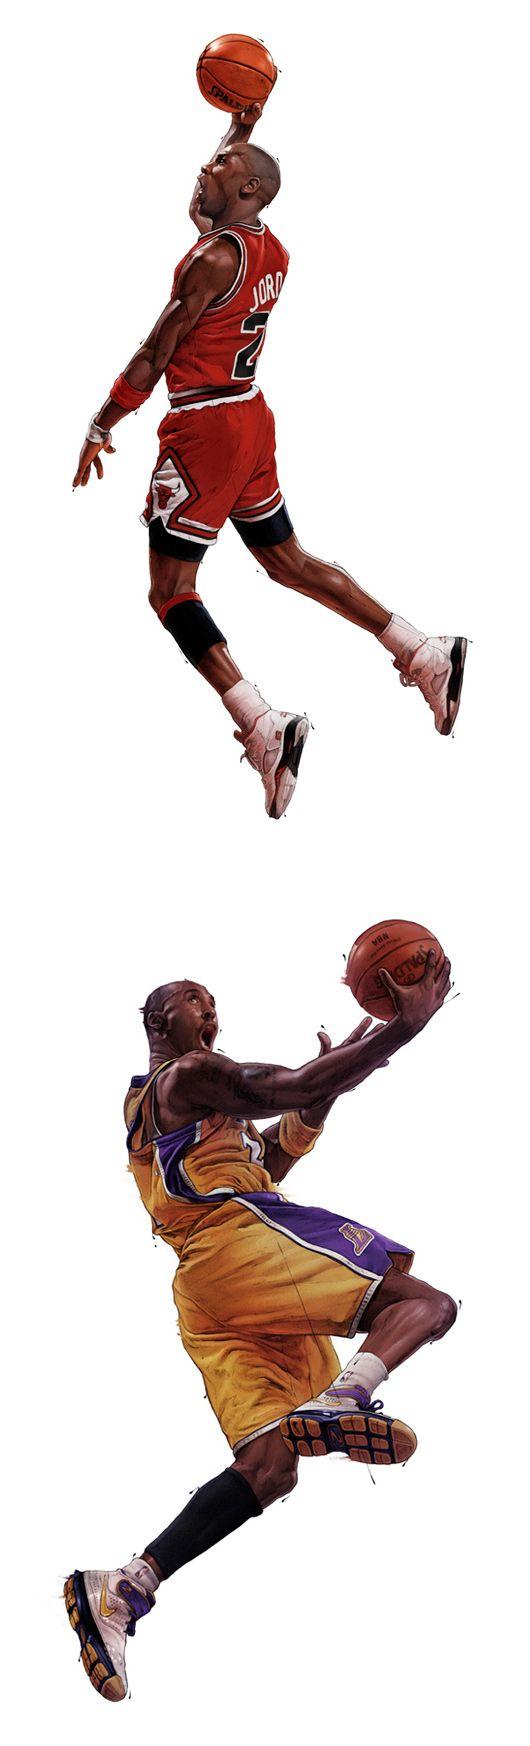 NBA Illustrations by Grzegorz Domaradzki